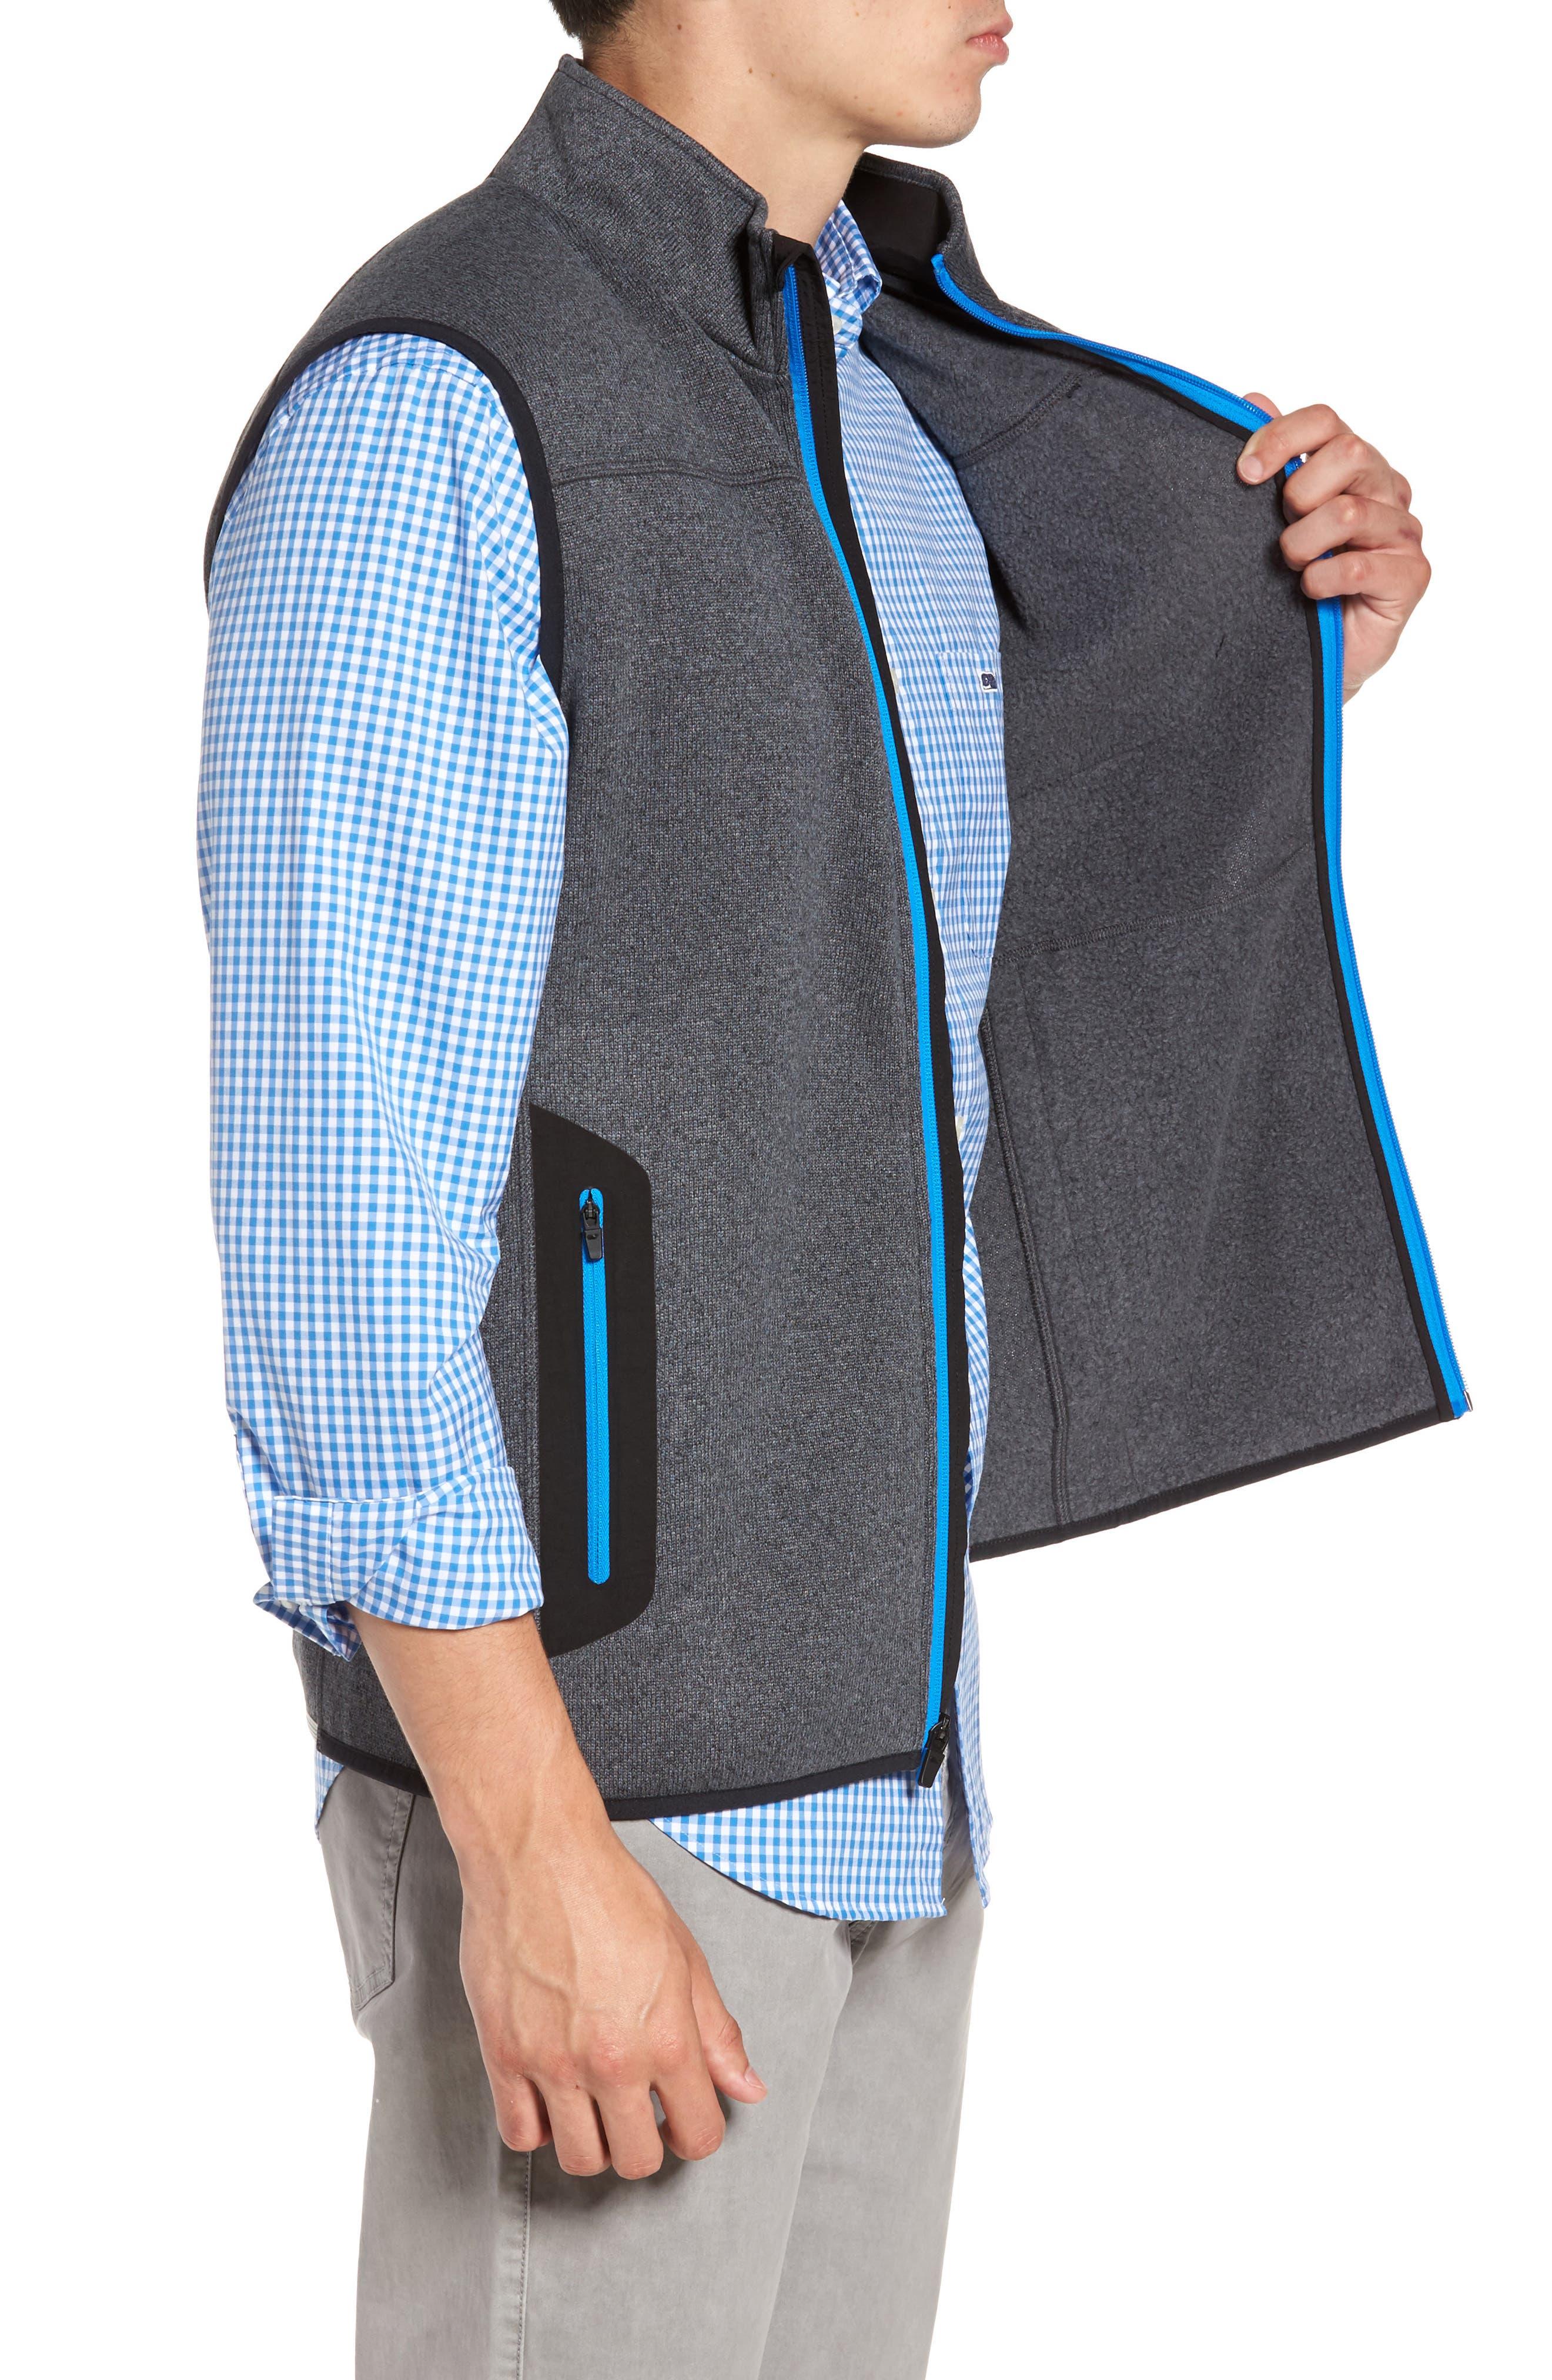 Tech Sweater Fleece Vest,                             Alternate thumbnail 3, color,                             020